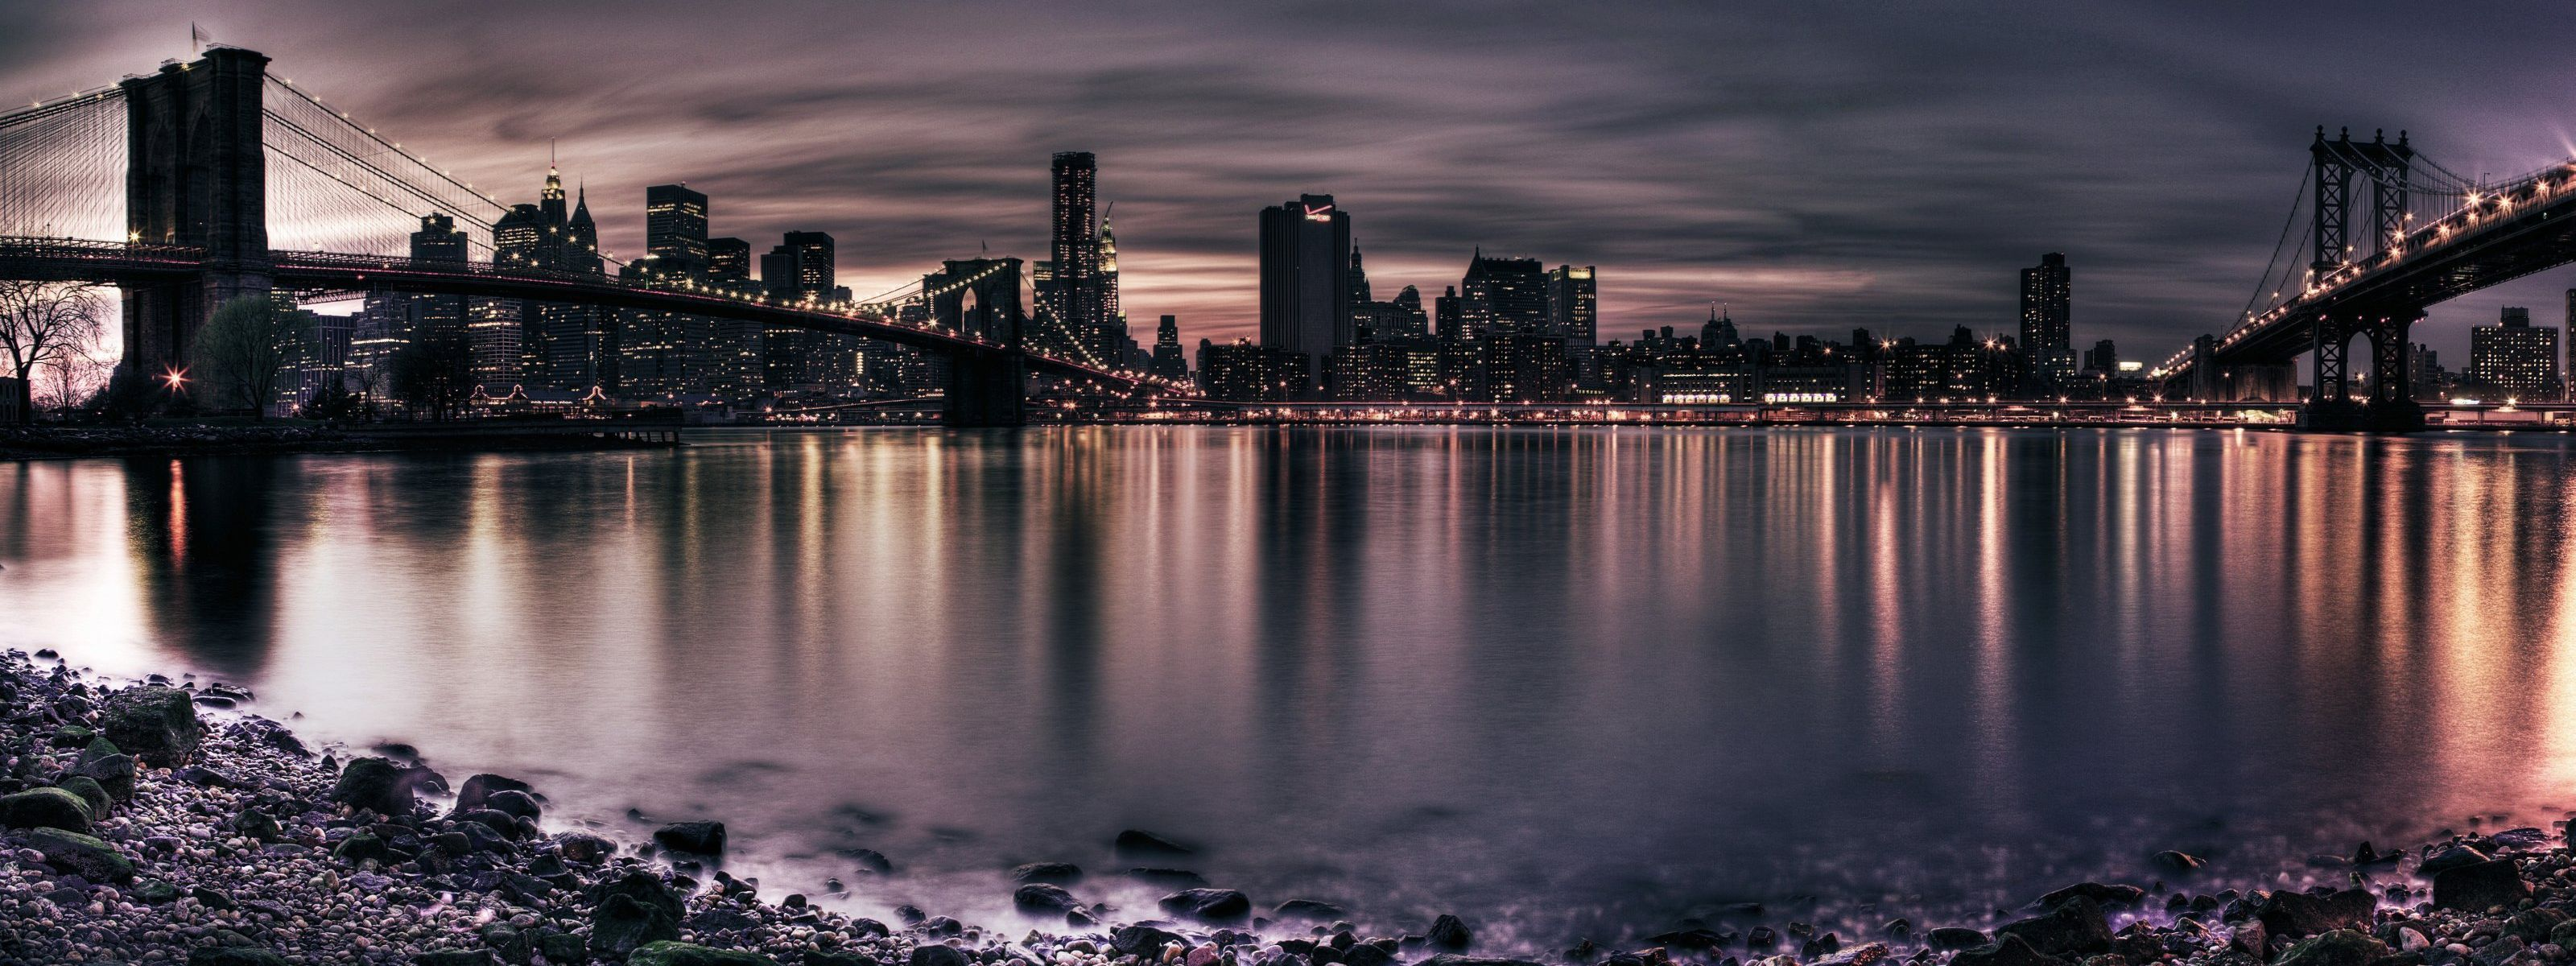 city landscape wallpaper new - photo #23